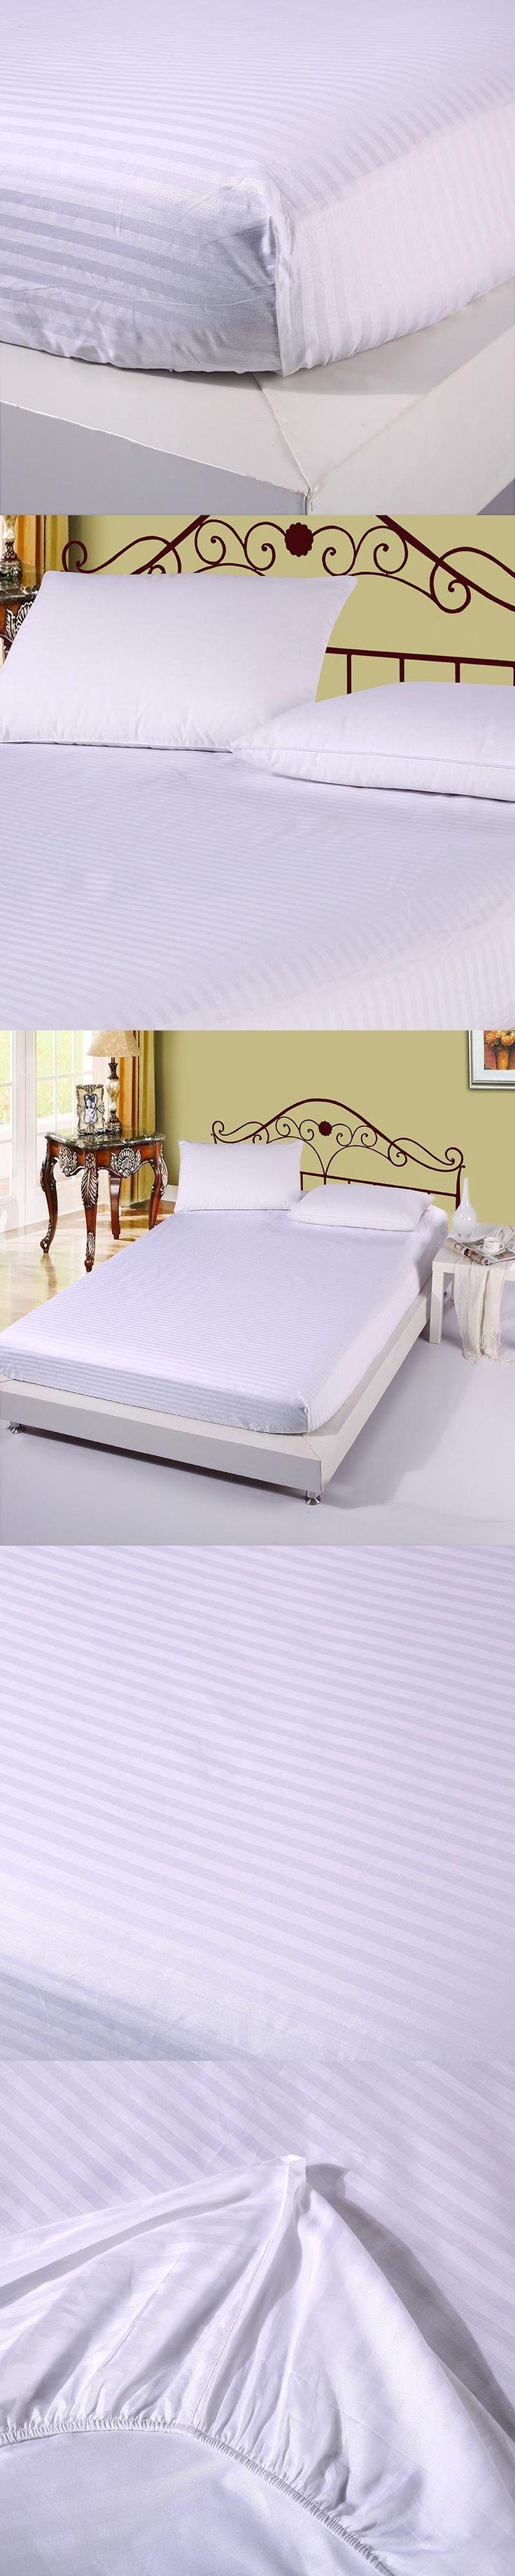 Best King size mattress ideas on Pinterest